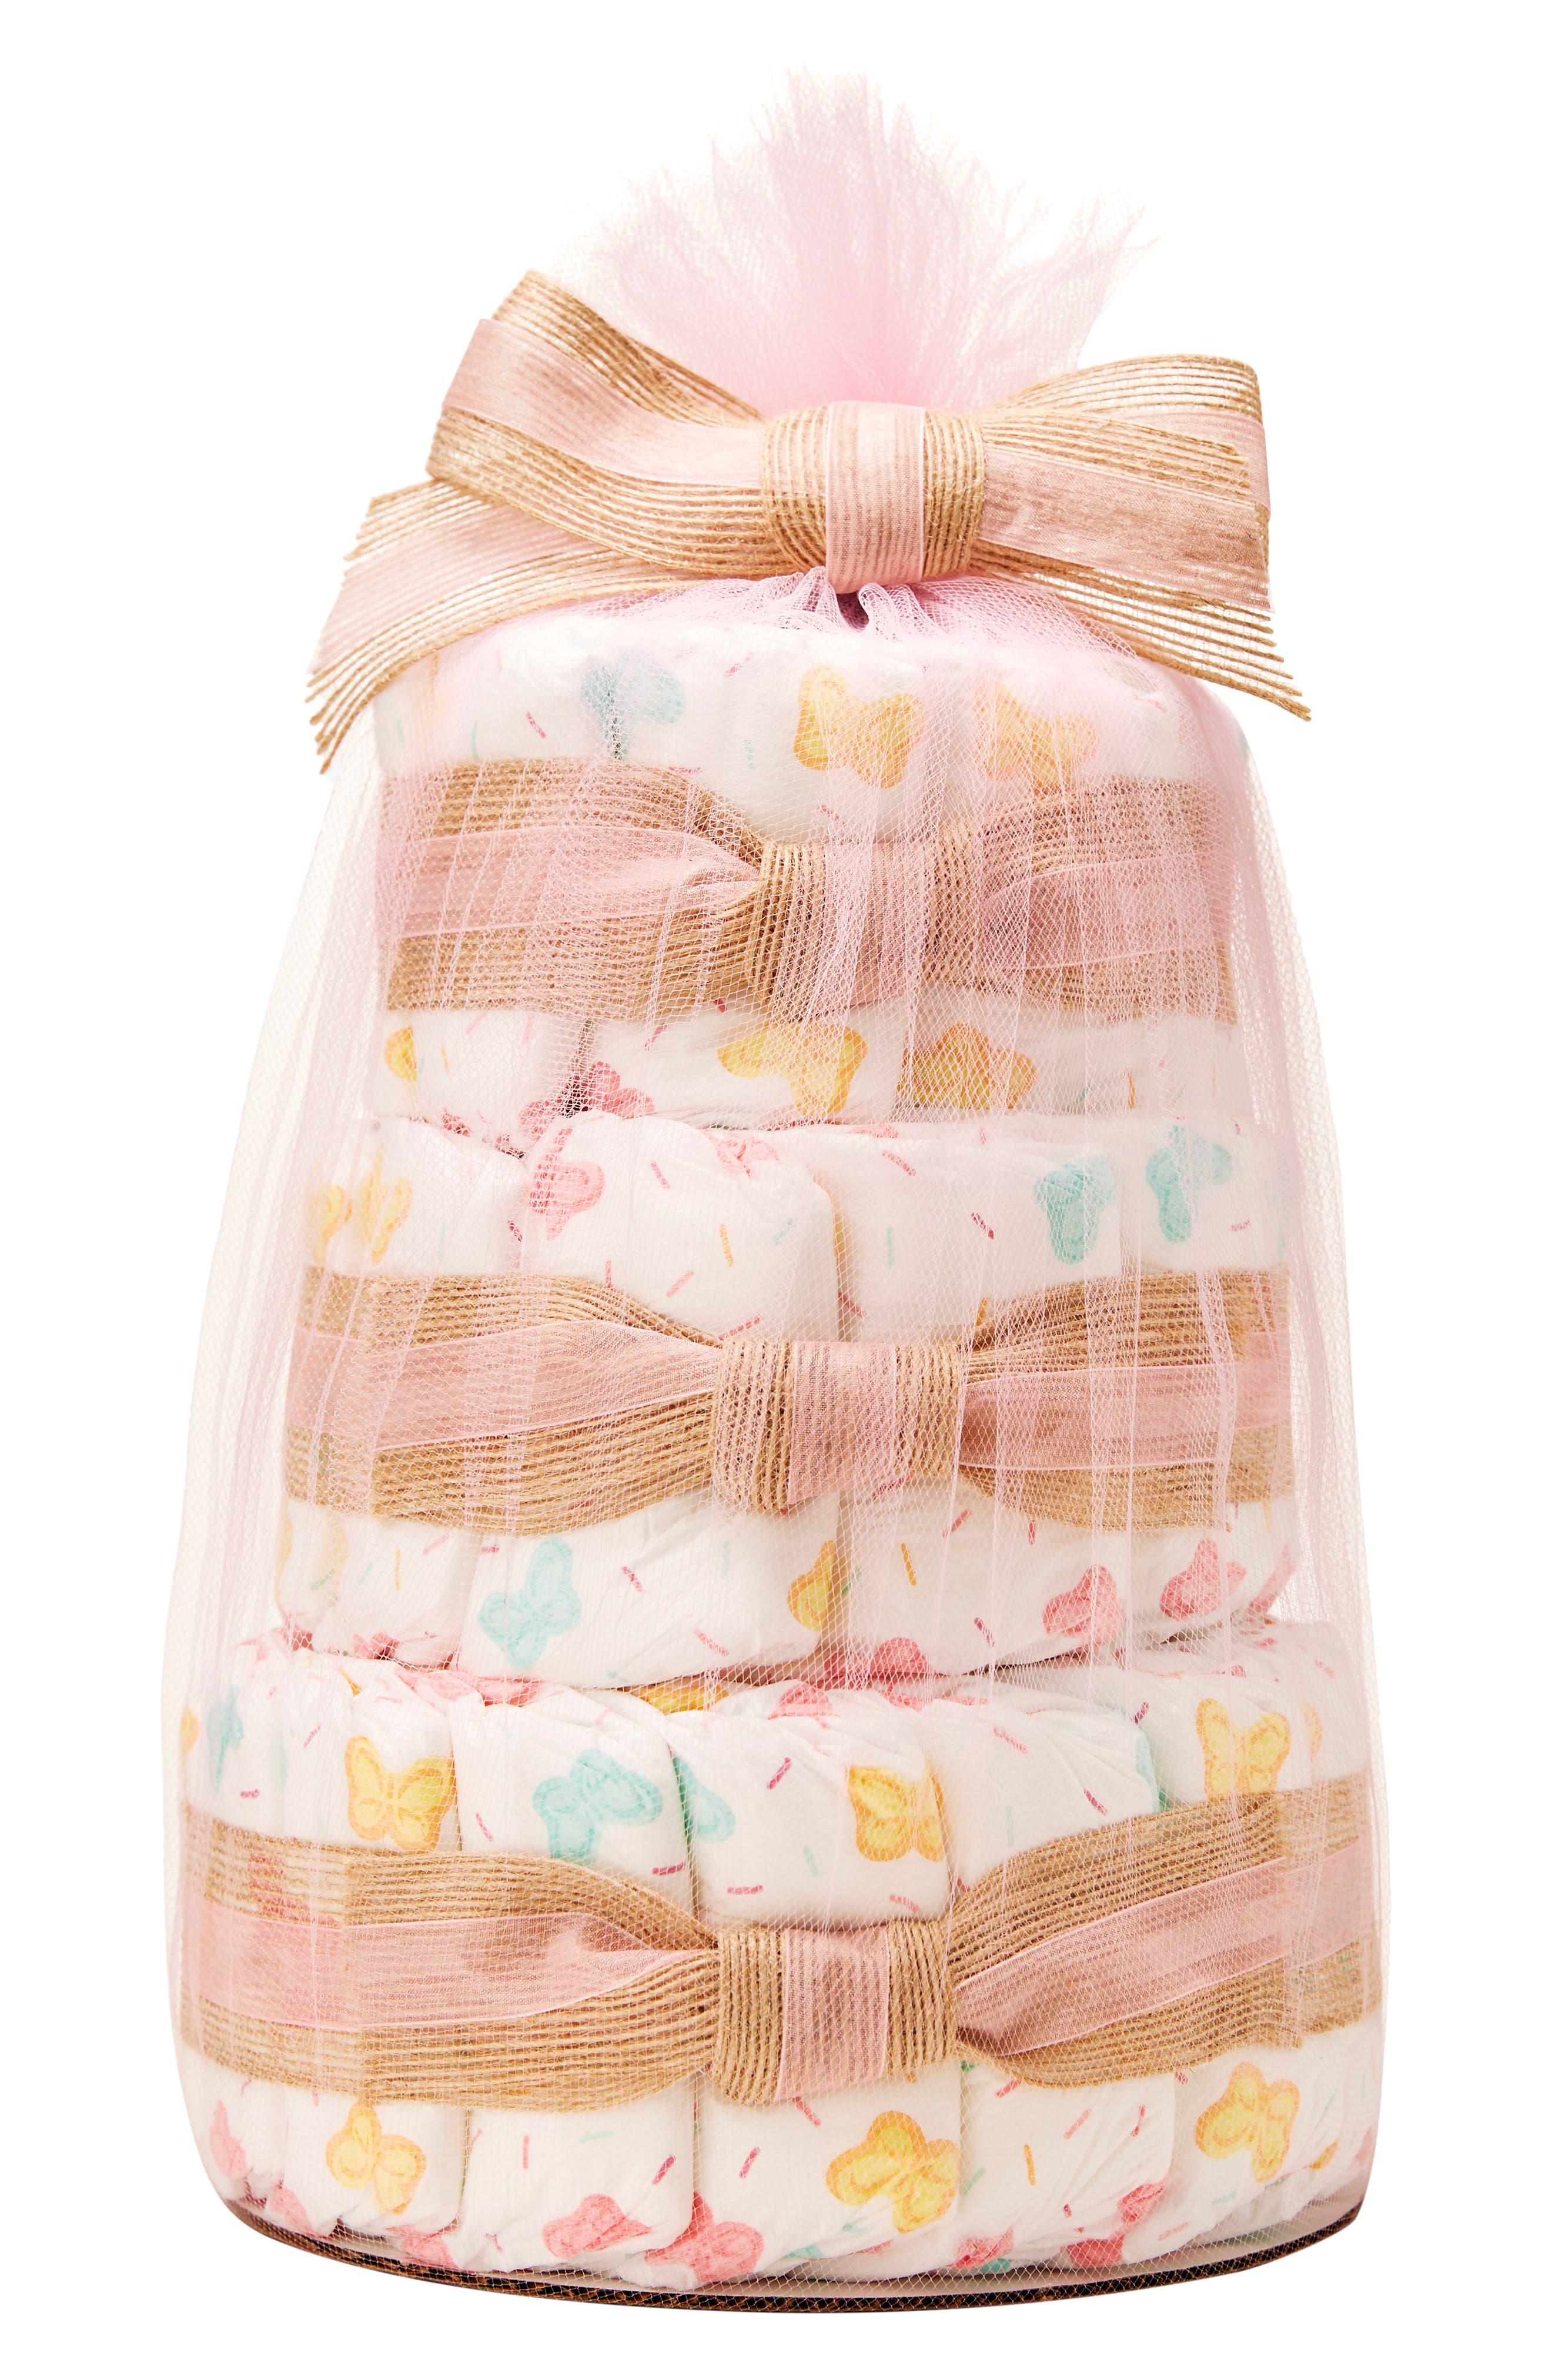 x Sugarfina Sweet Thing Mini Diaper Cake,                         Main,                         color, 104